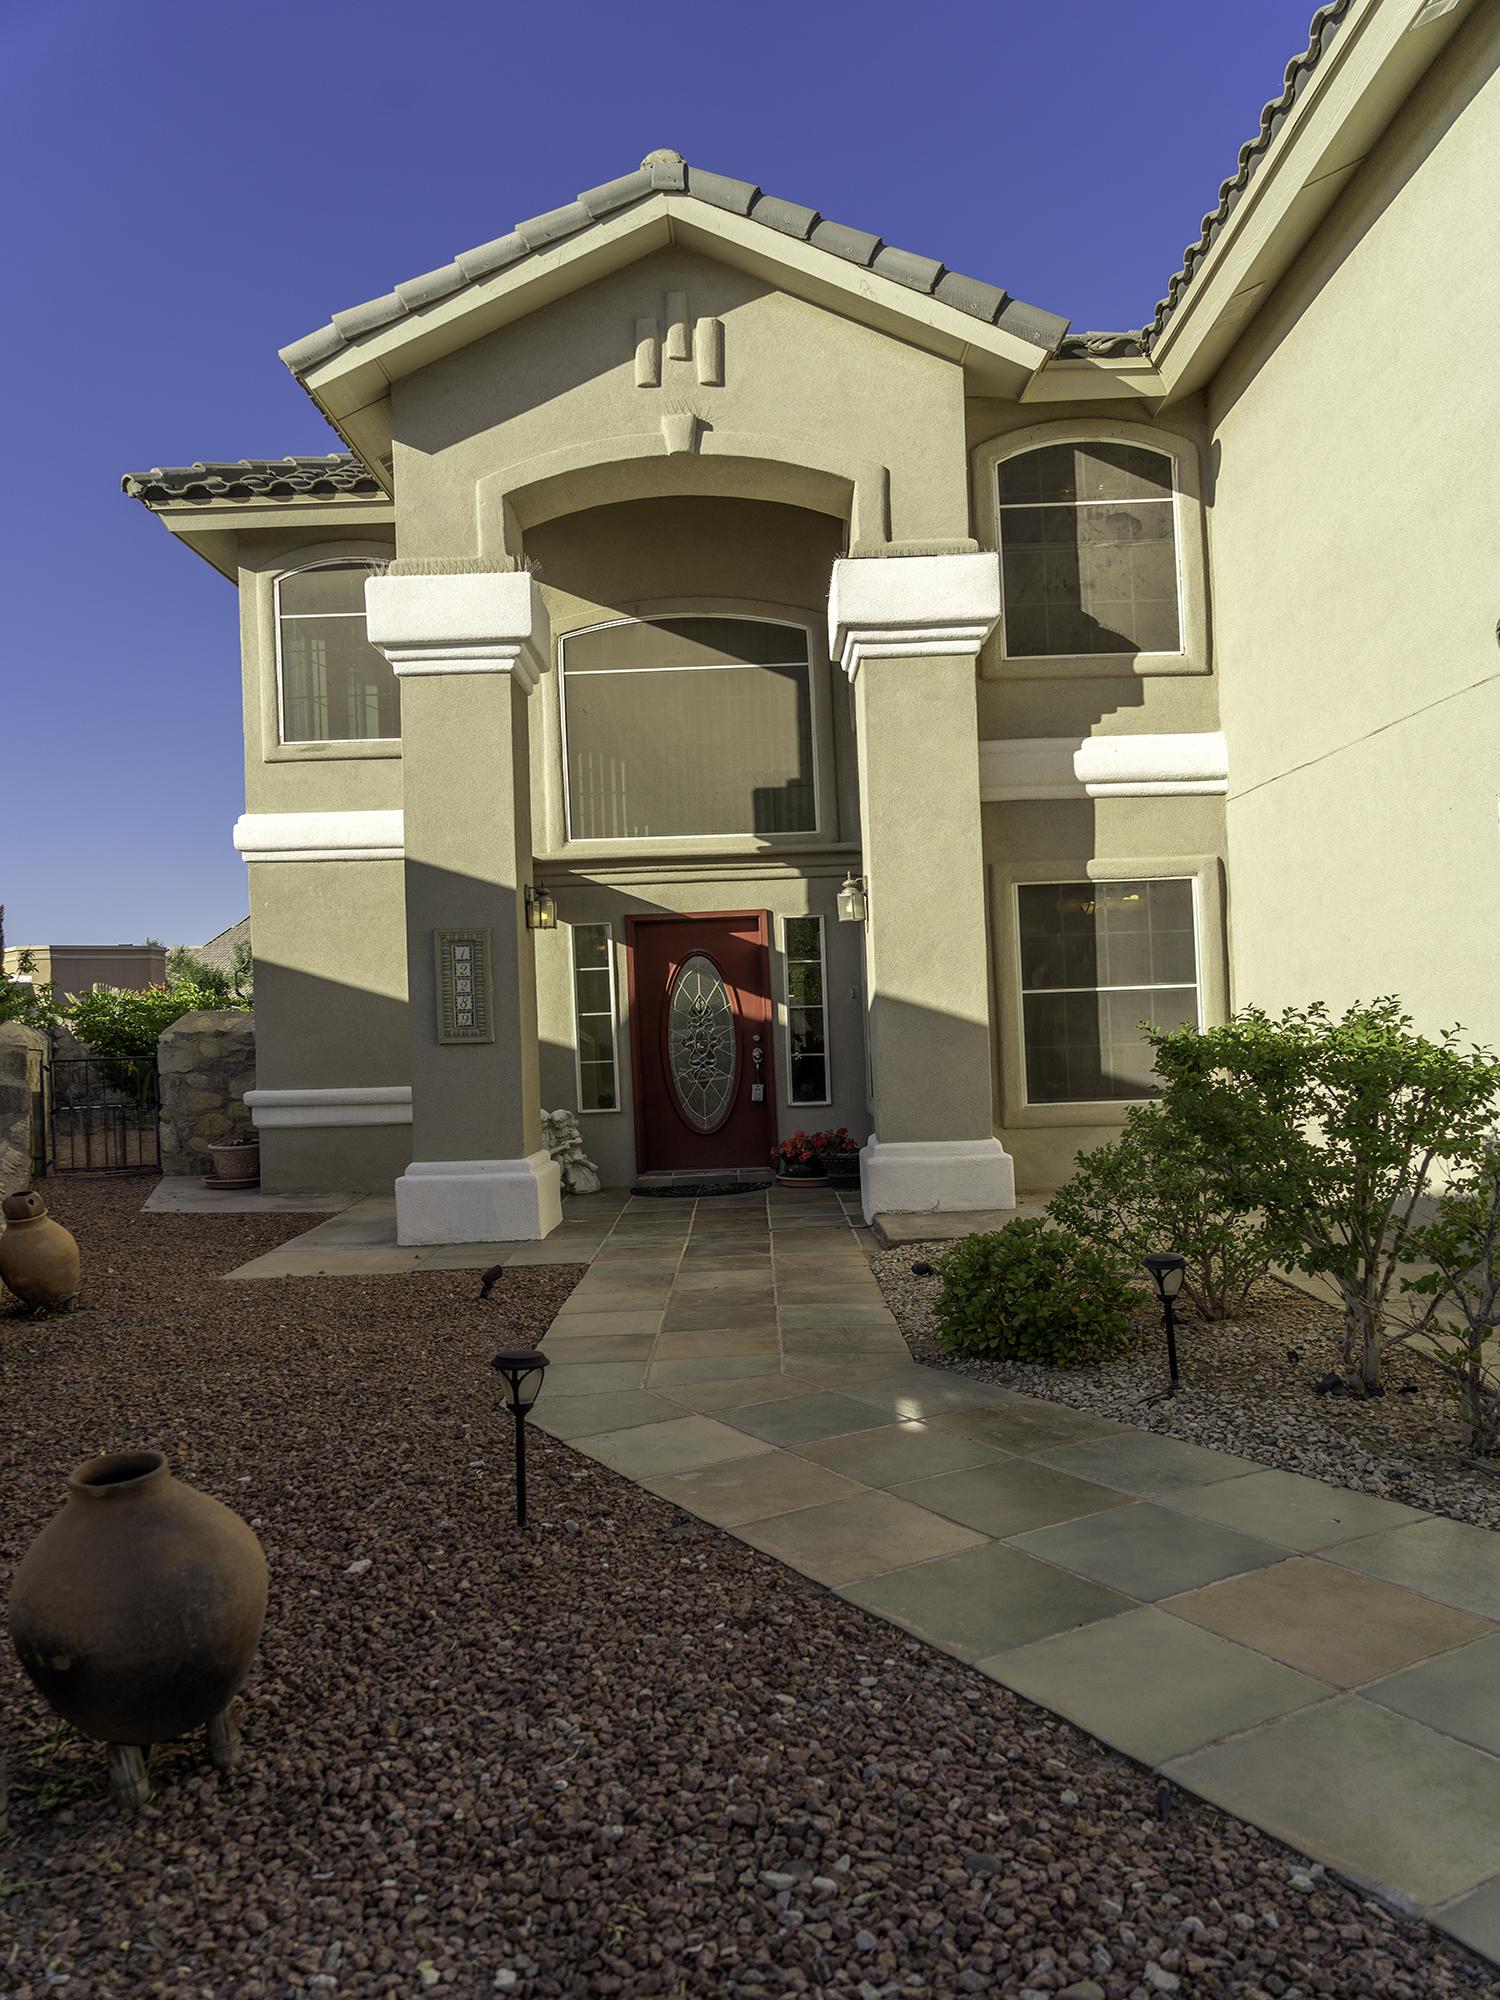 12289 ROBERTA LYNNE, El Paso, Texas 79936, 4 Bedrooms Bedrooms, ,3 BathroomsBathrooms,Residential,For sale,ROBERTA LYNNE,808252